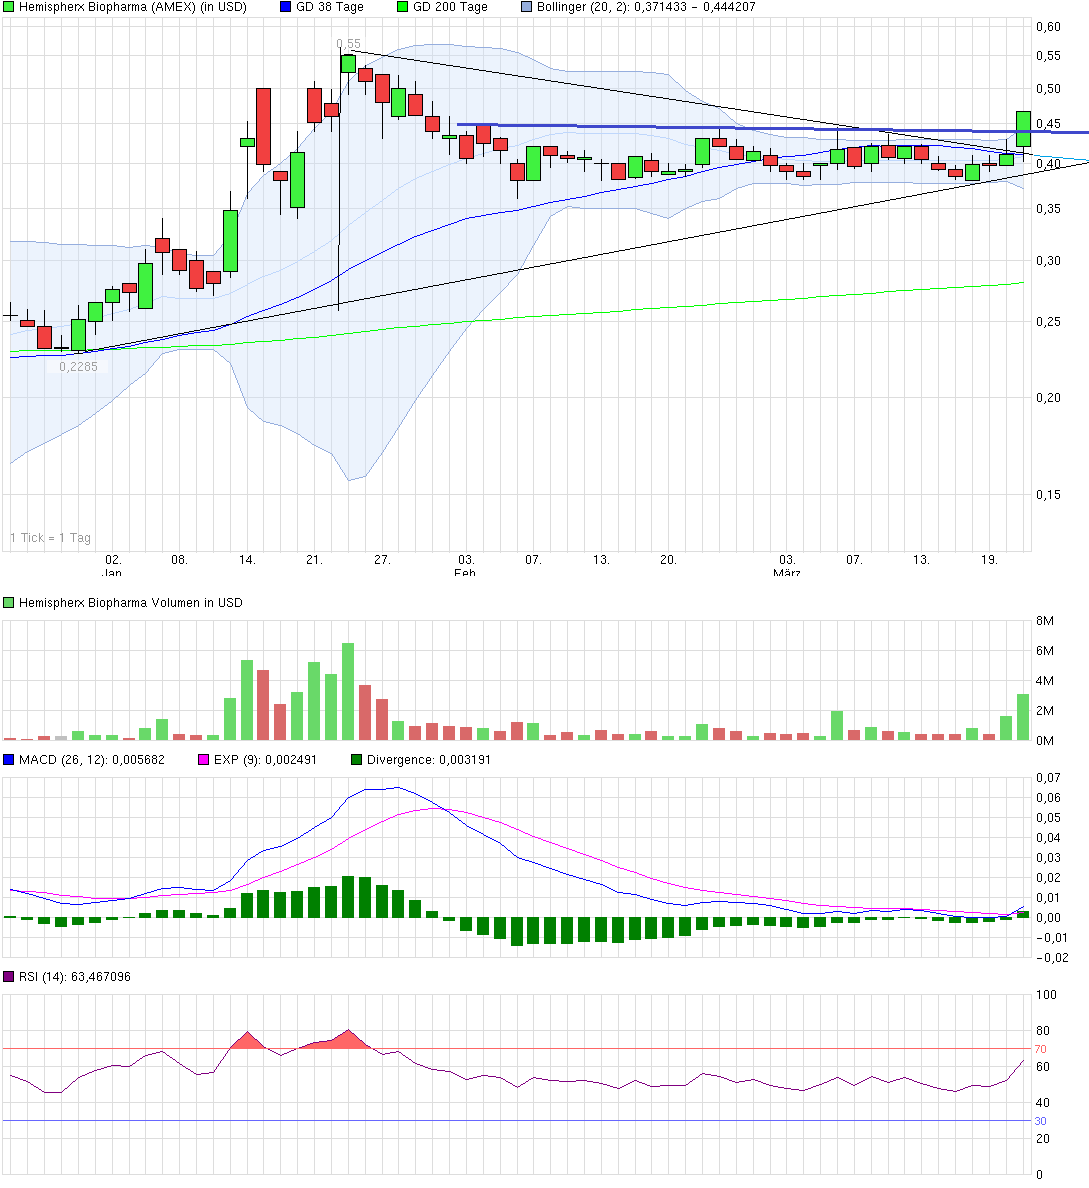 chart_quarter_hemispherxbiopharma.png